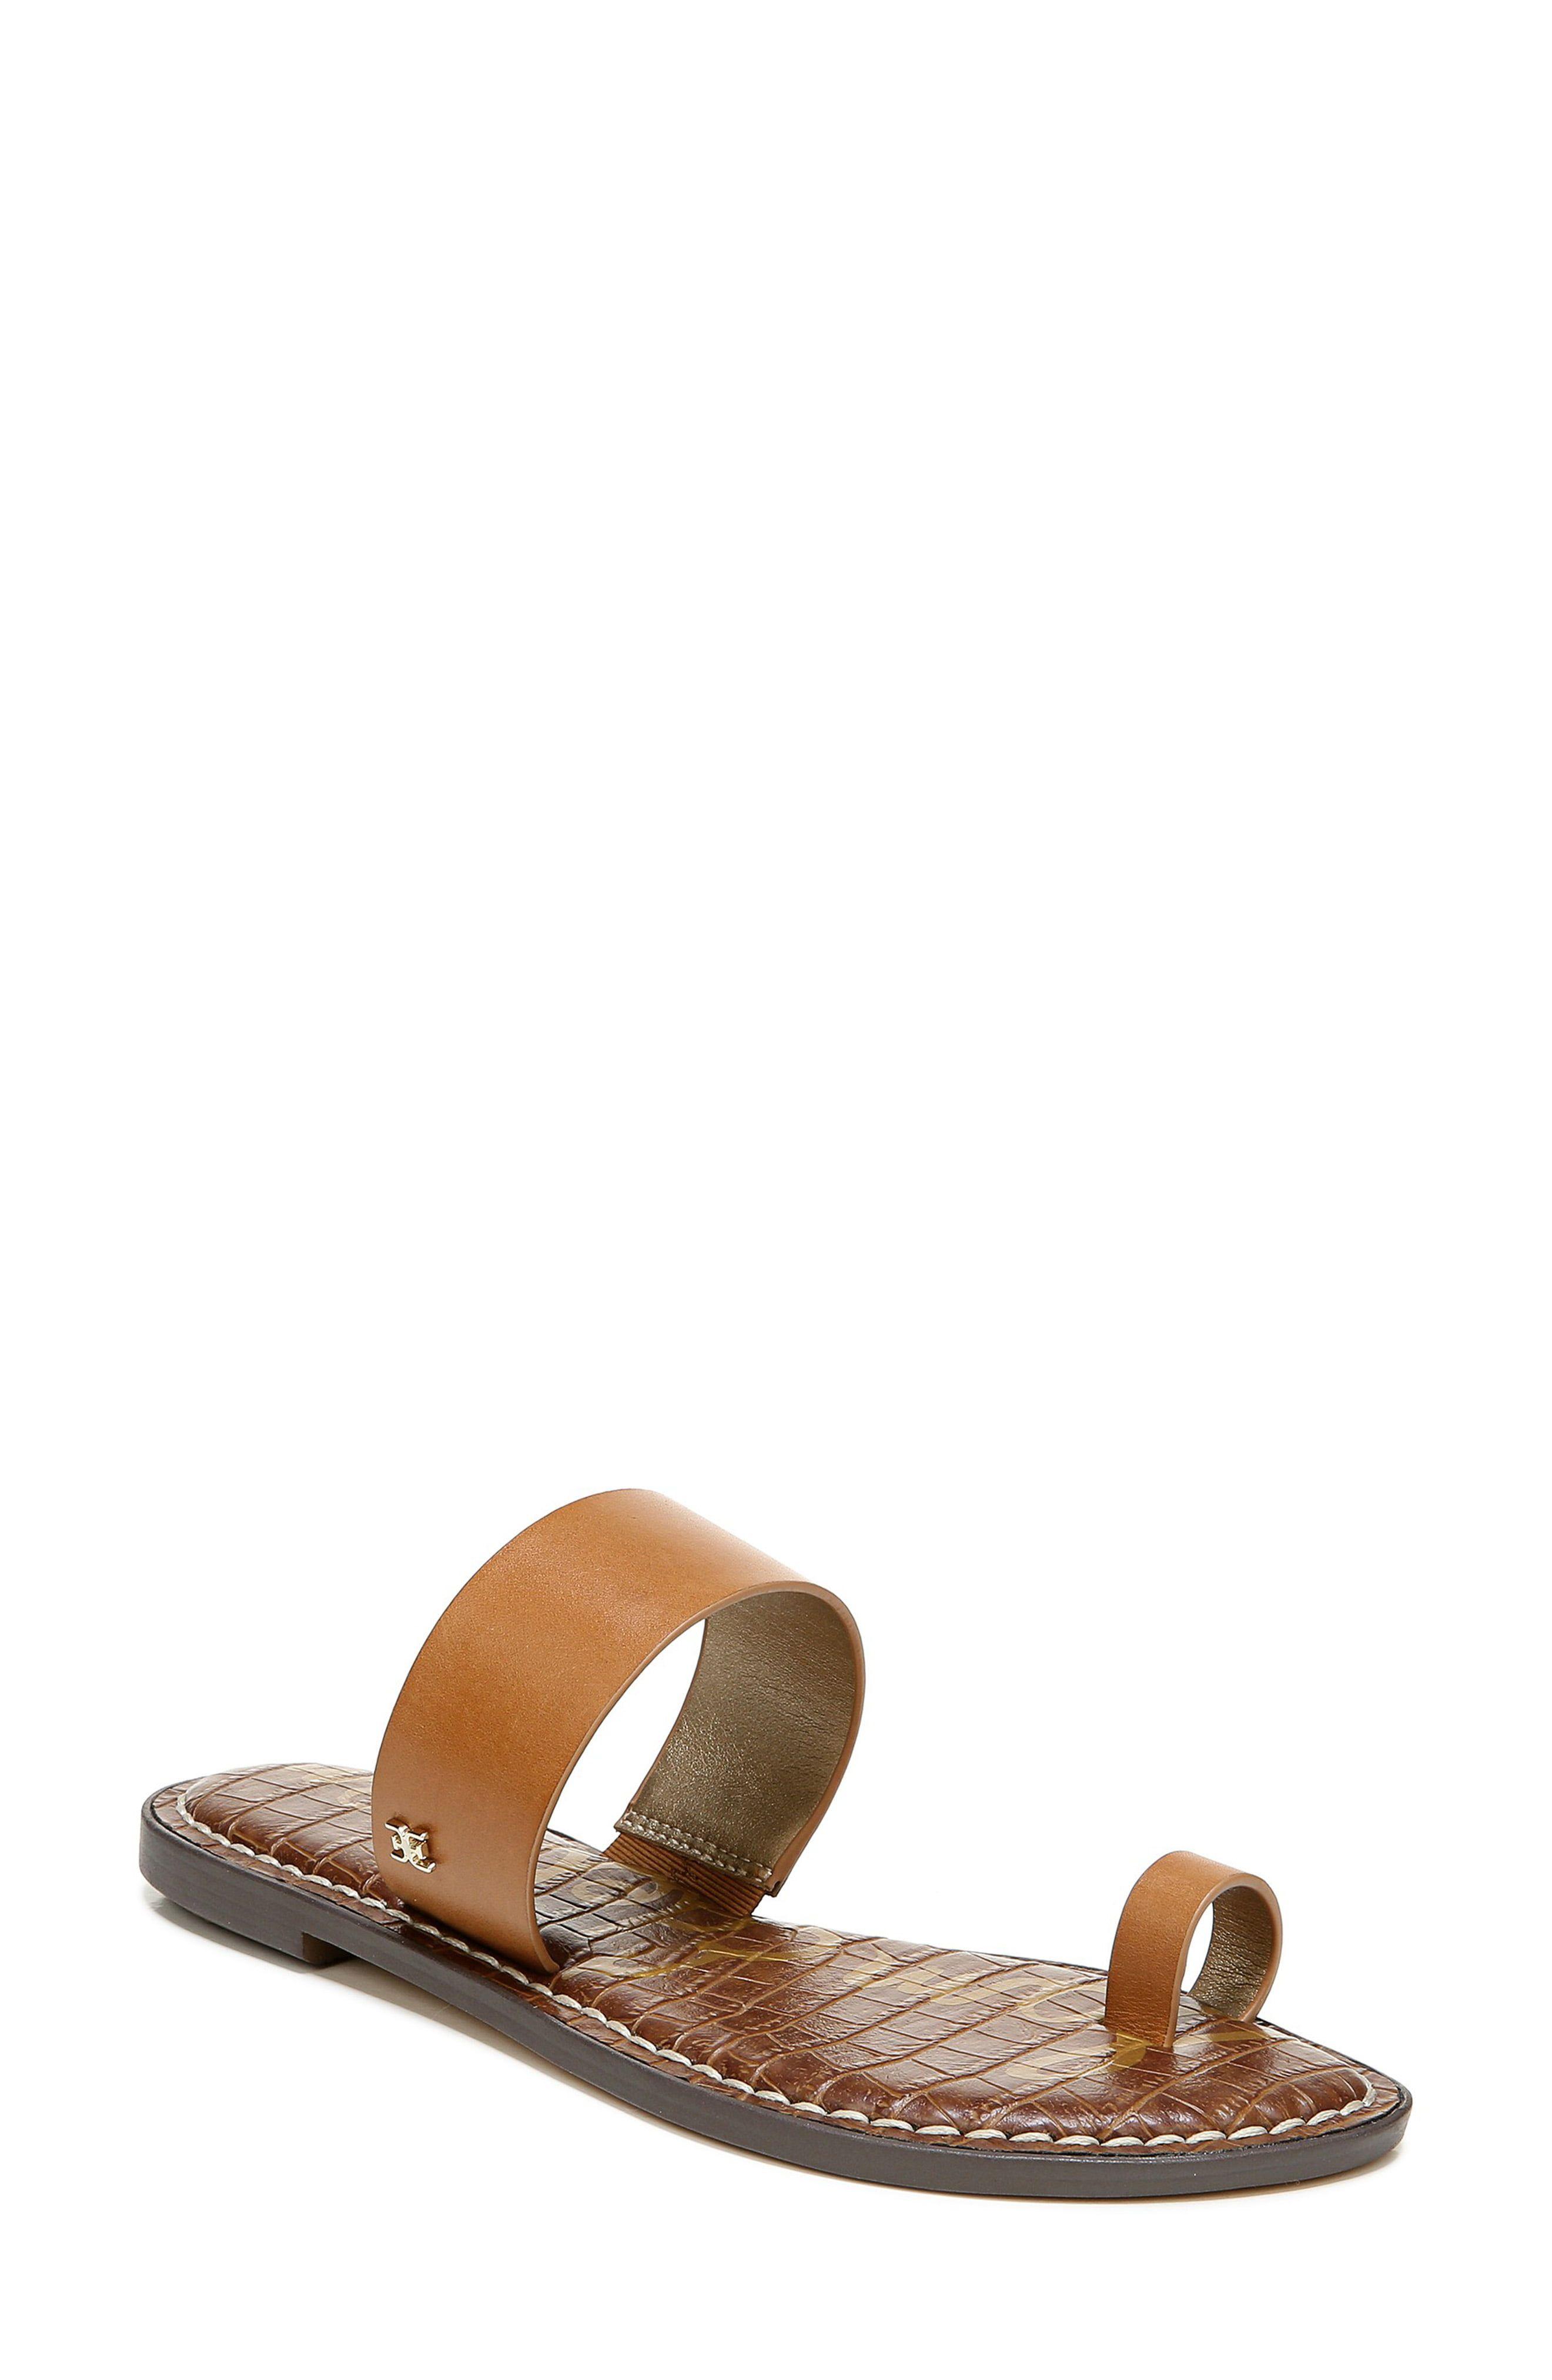 Women S Sam Edelman Gorgene Flat Sandal Size 5 M Black In 2020 Flat Sandals Sandals Flats